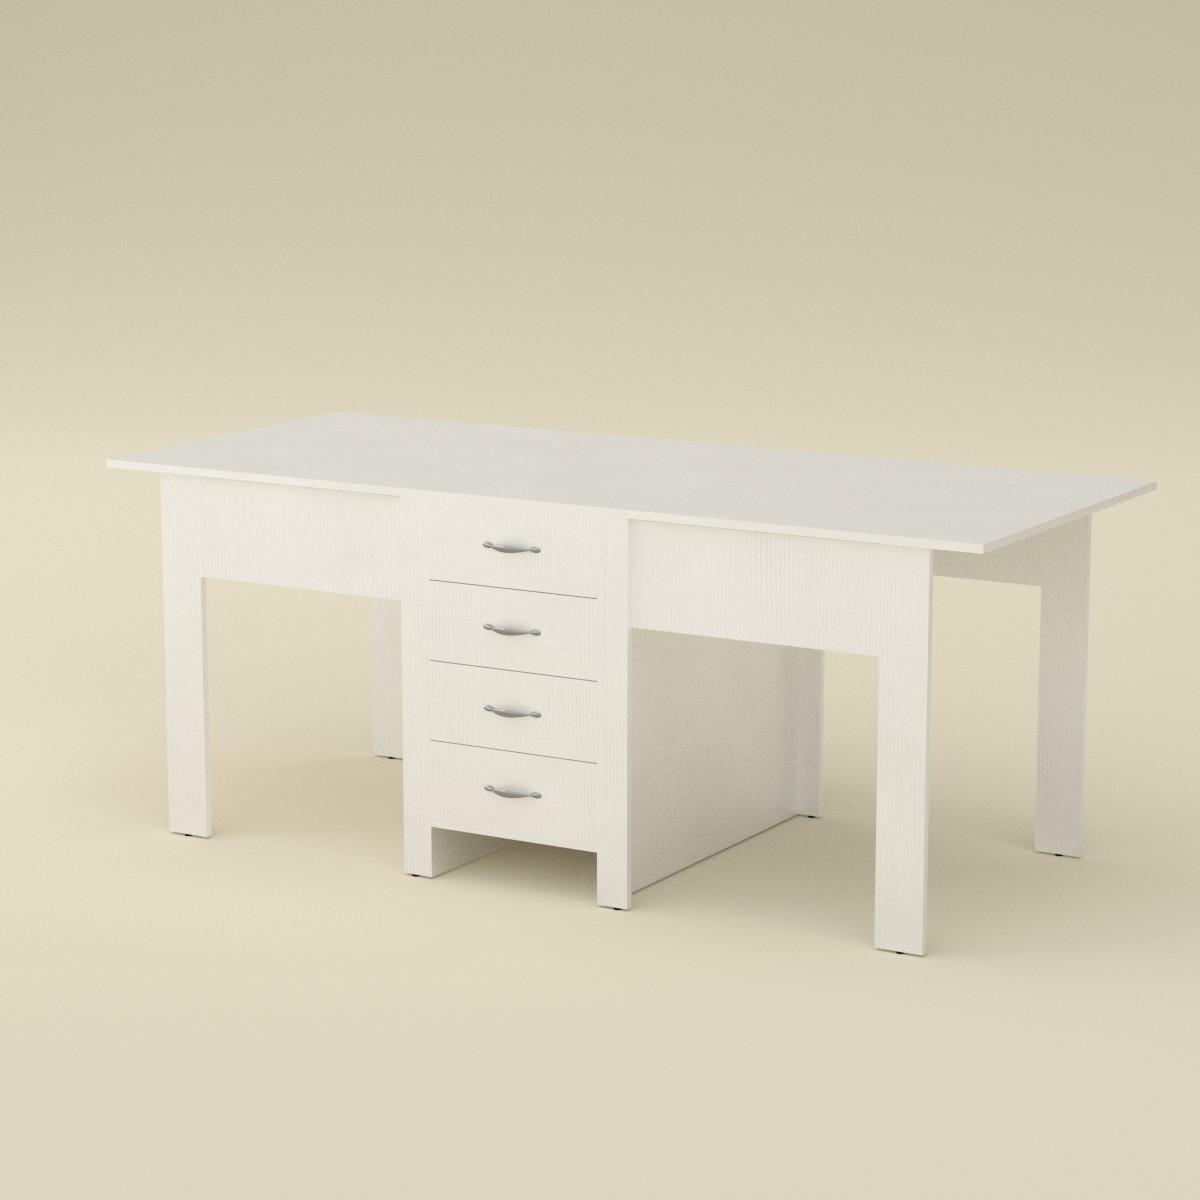 Стол книжка 3 белый Компанит (190х53х75 см)